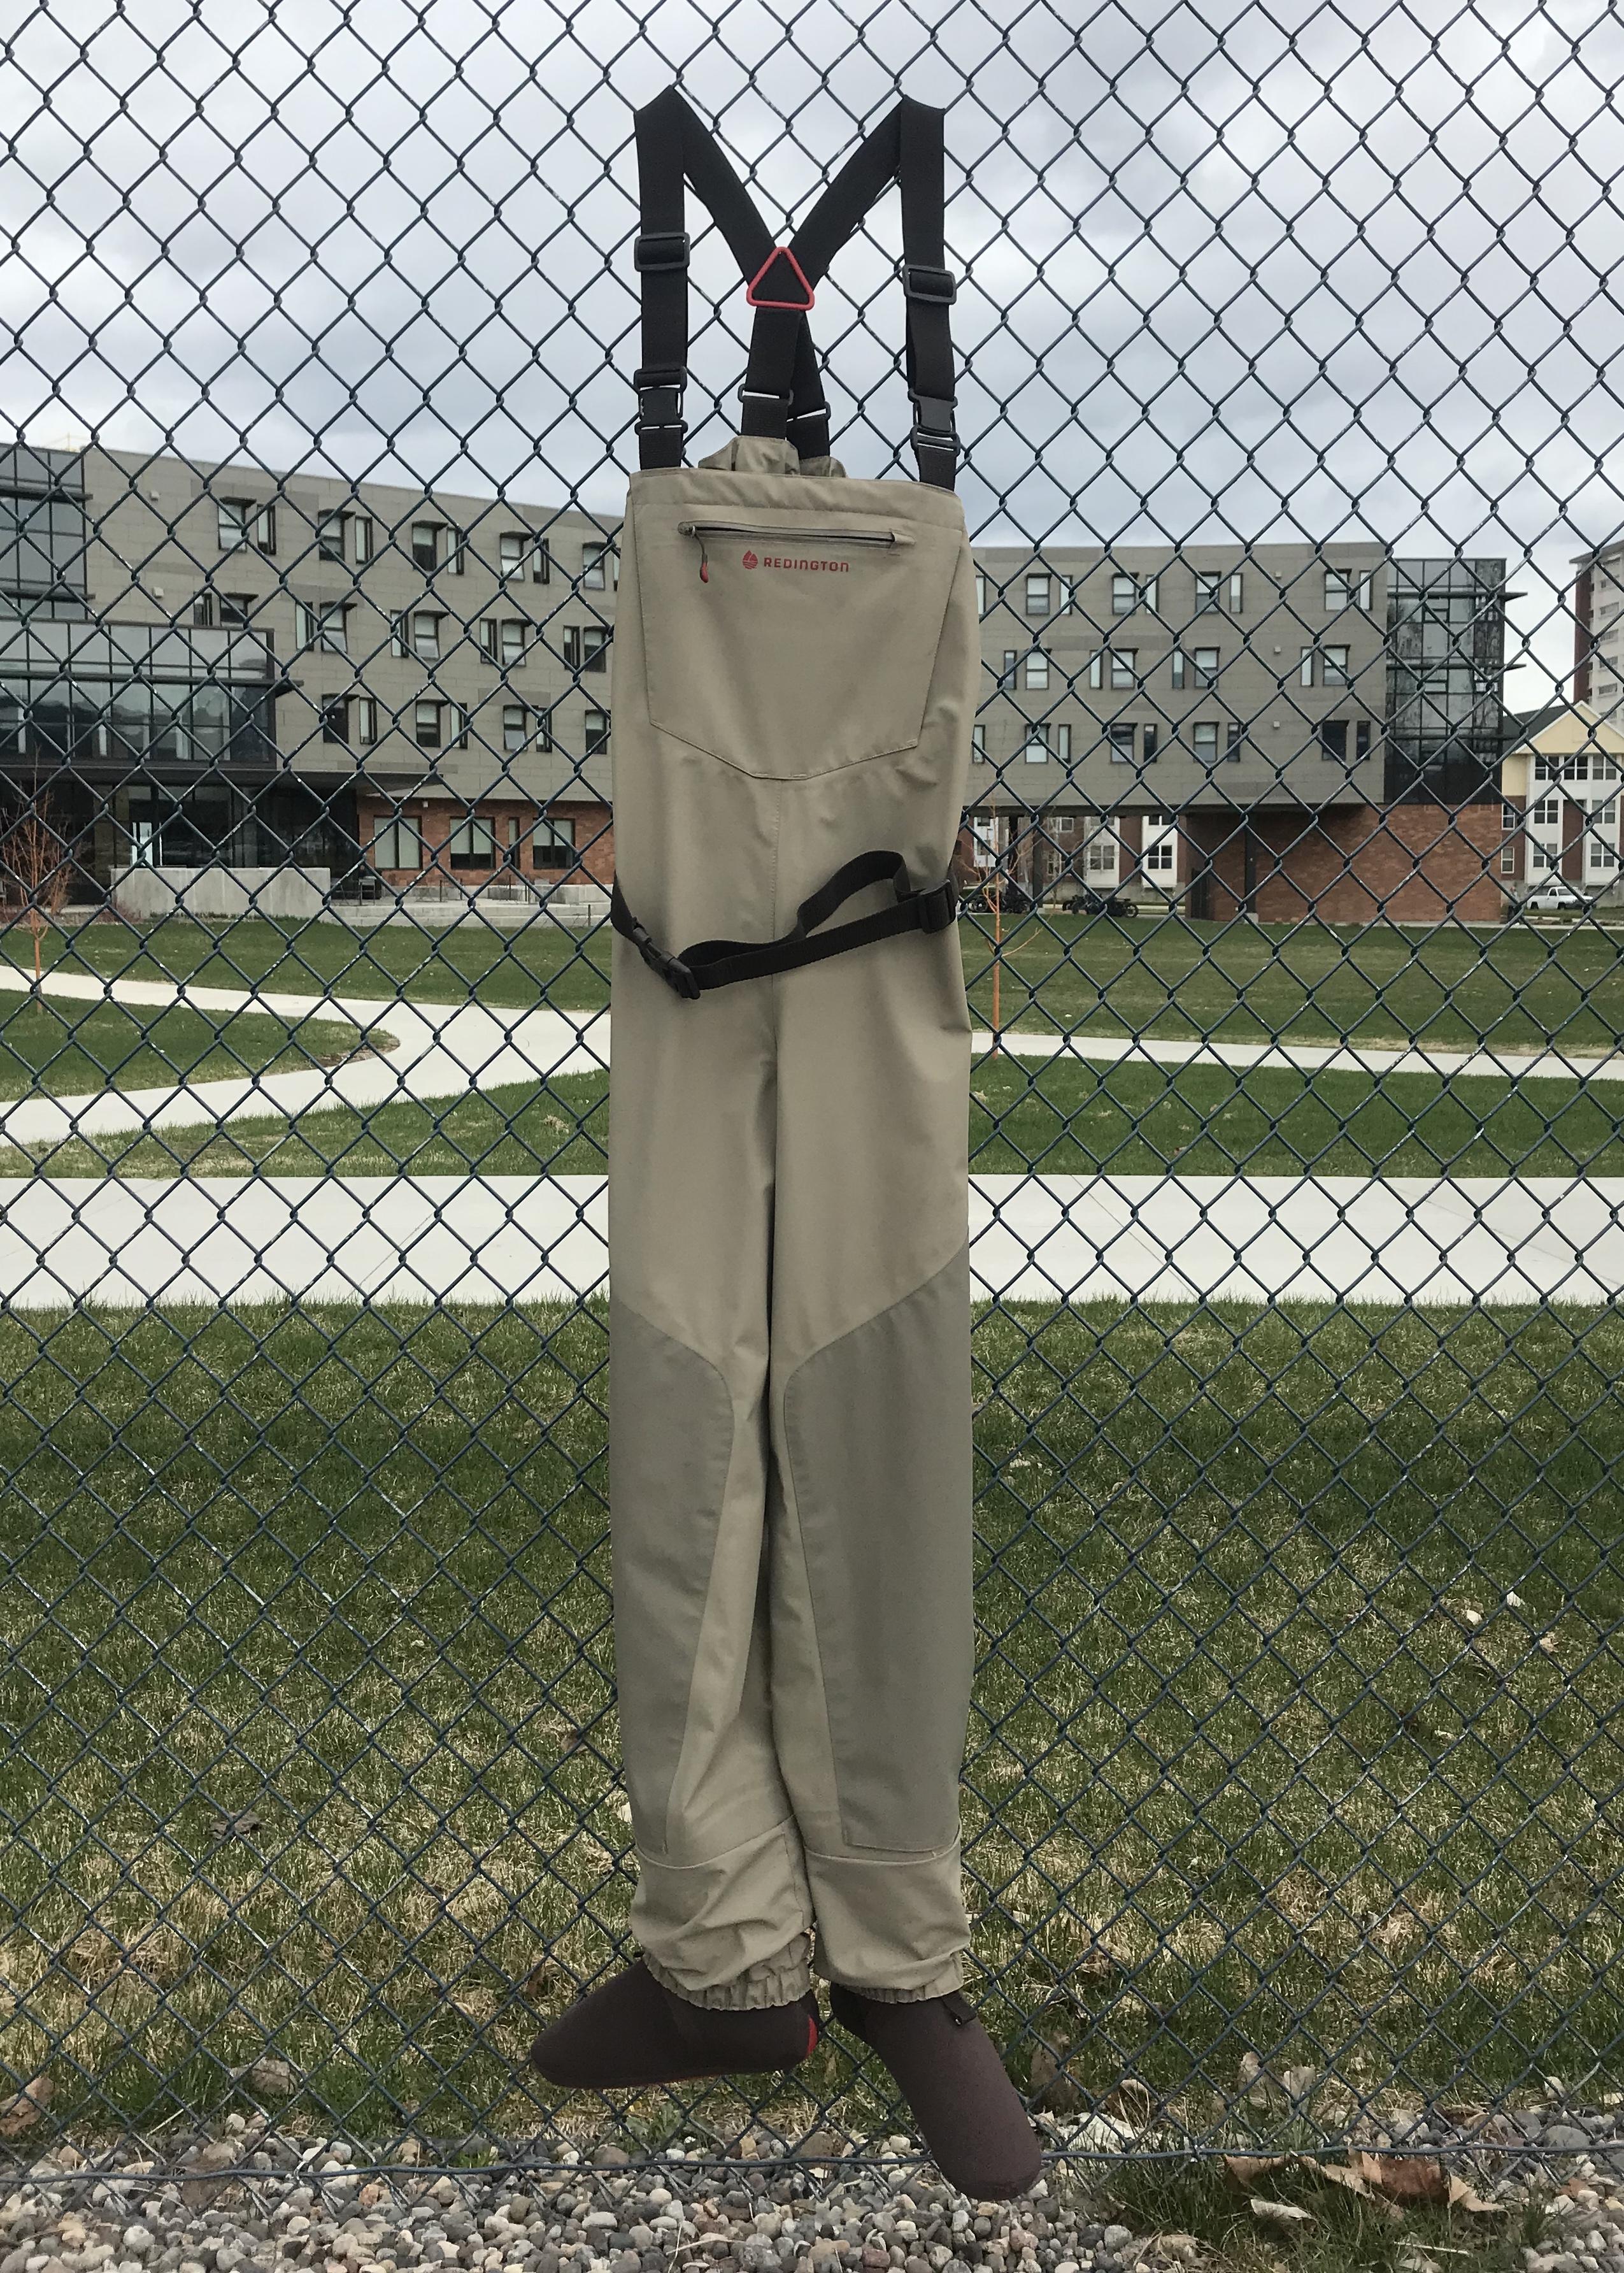 Rental Gear - Outdoor Recreation | Montana State University